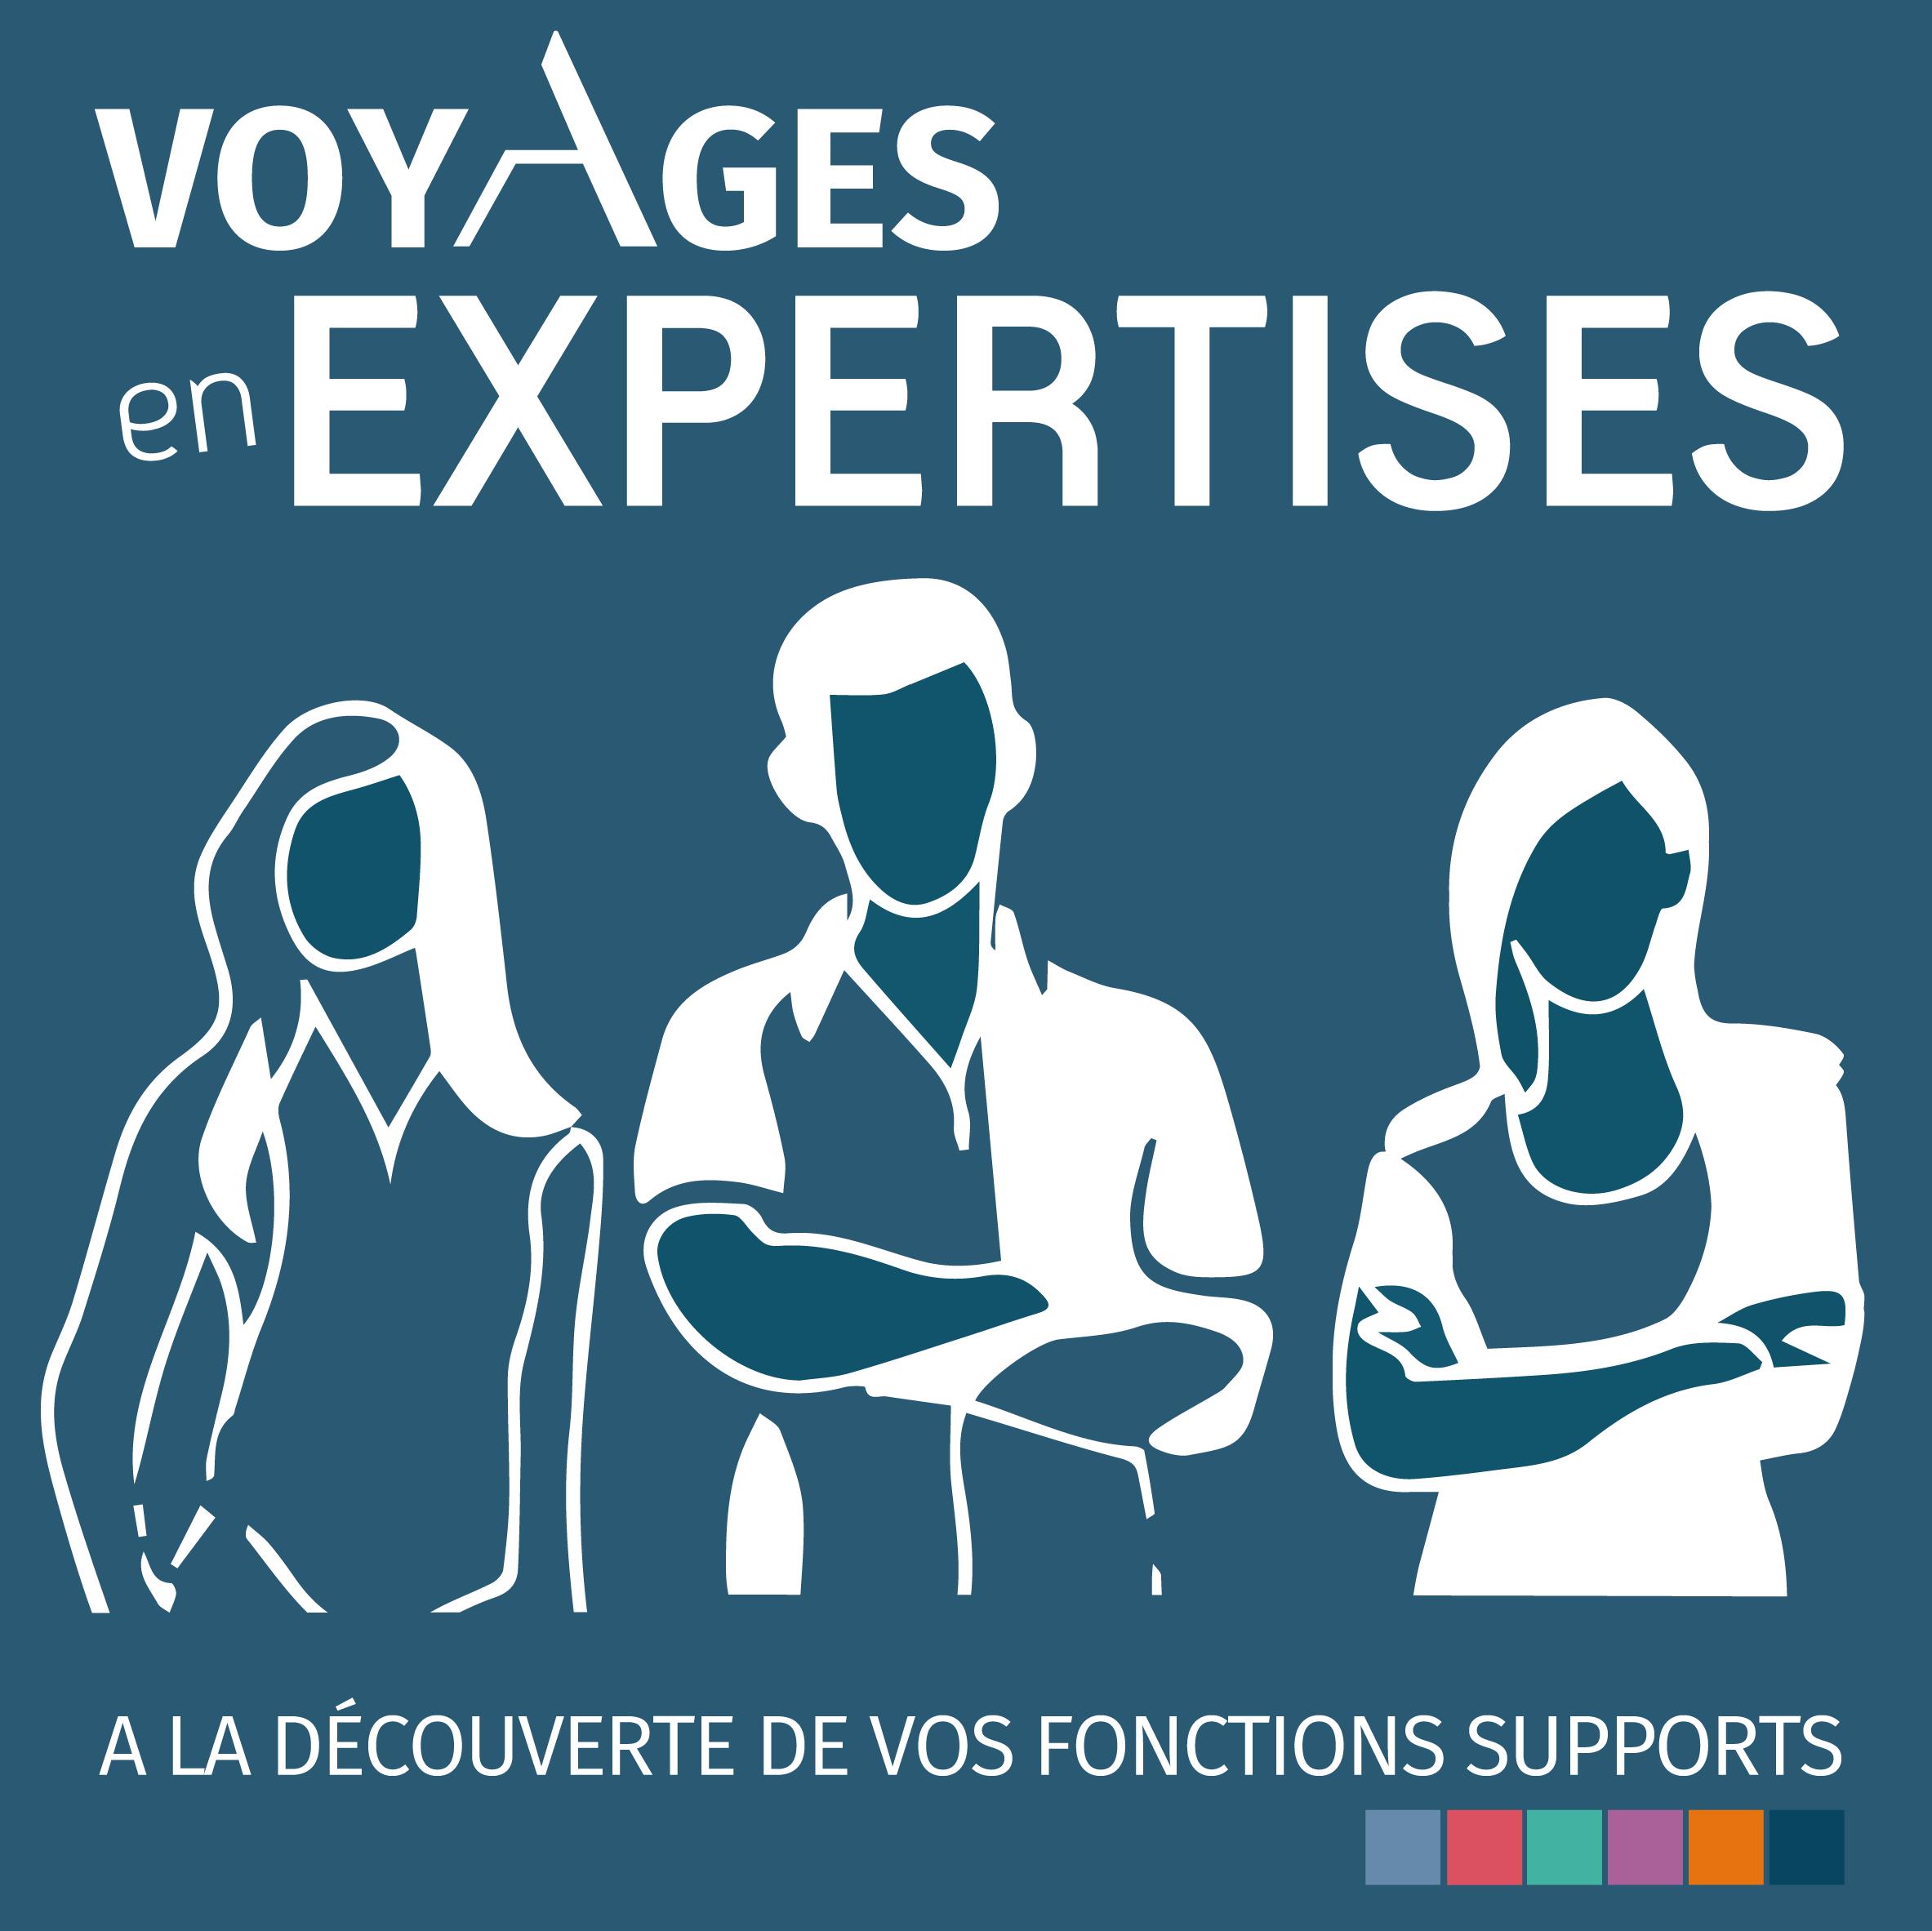 VOYAGES EN EXPERTISES